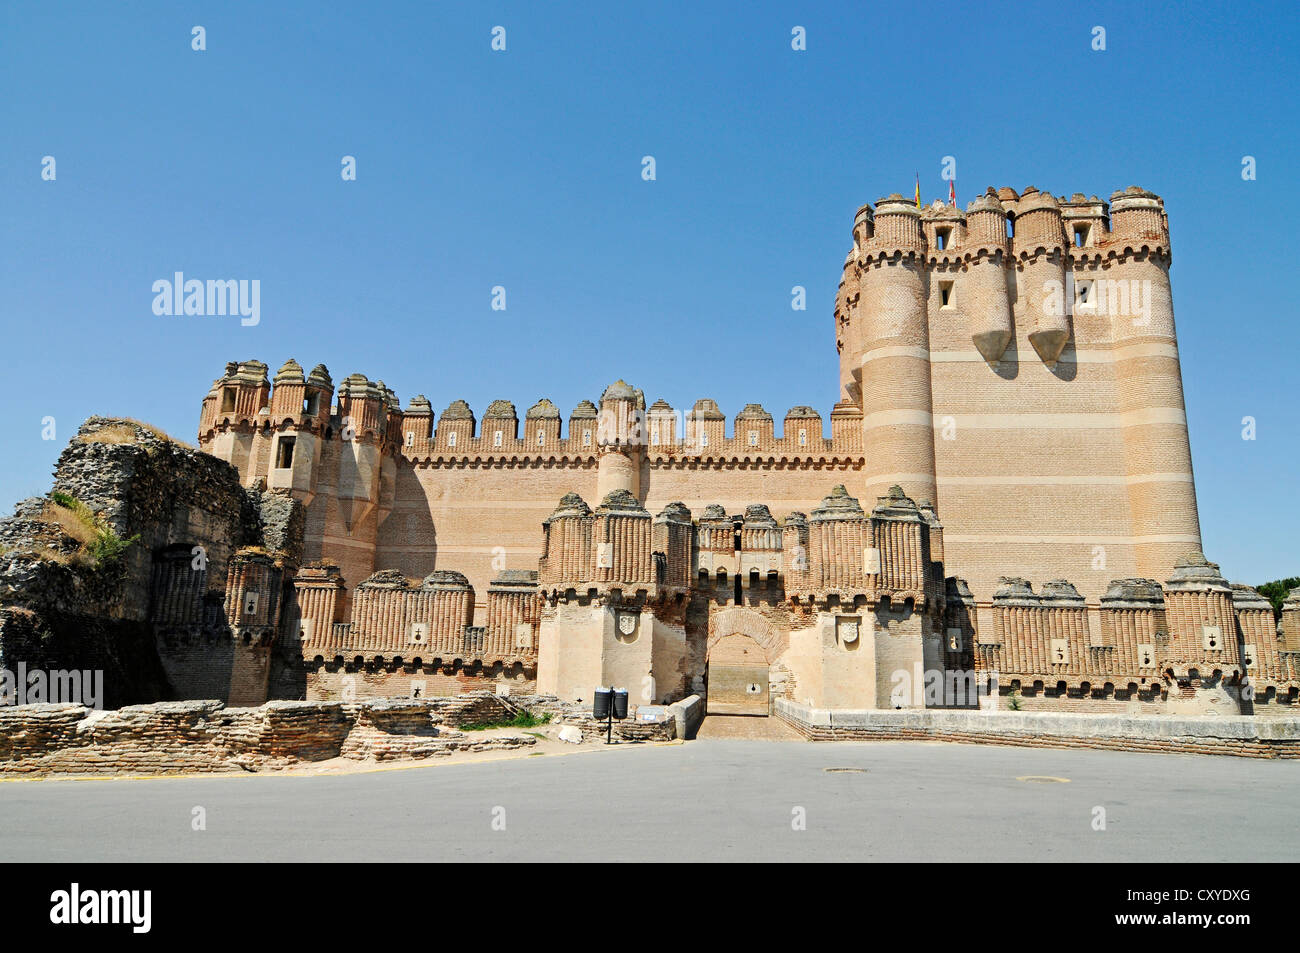 Castillo, castle, Mudejar style, museum, Coca, Segovia province, Castile and León, Spain, Europe, PublicGround - Stock Image